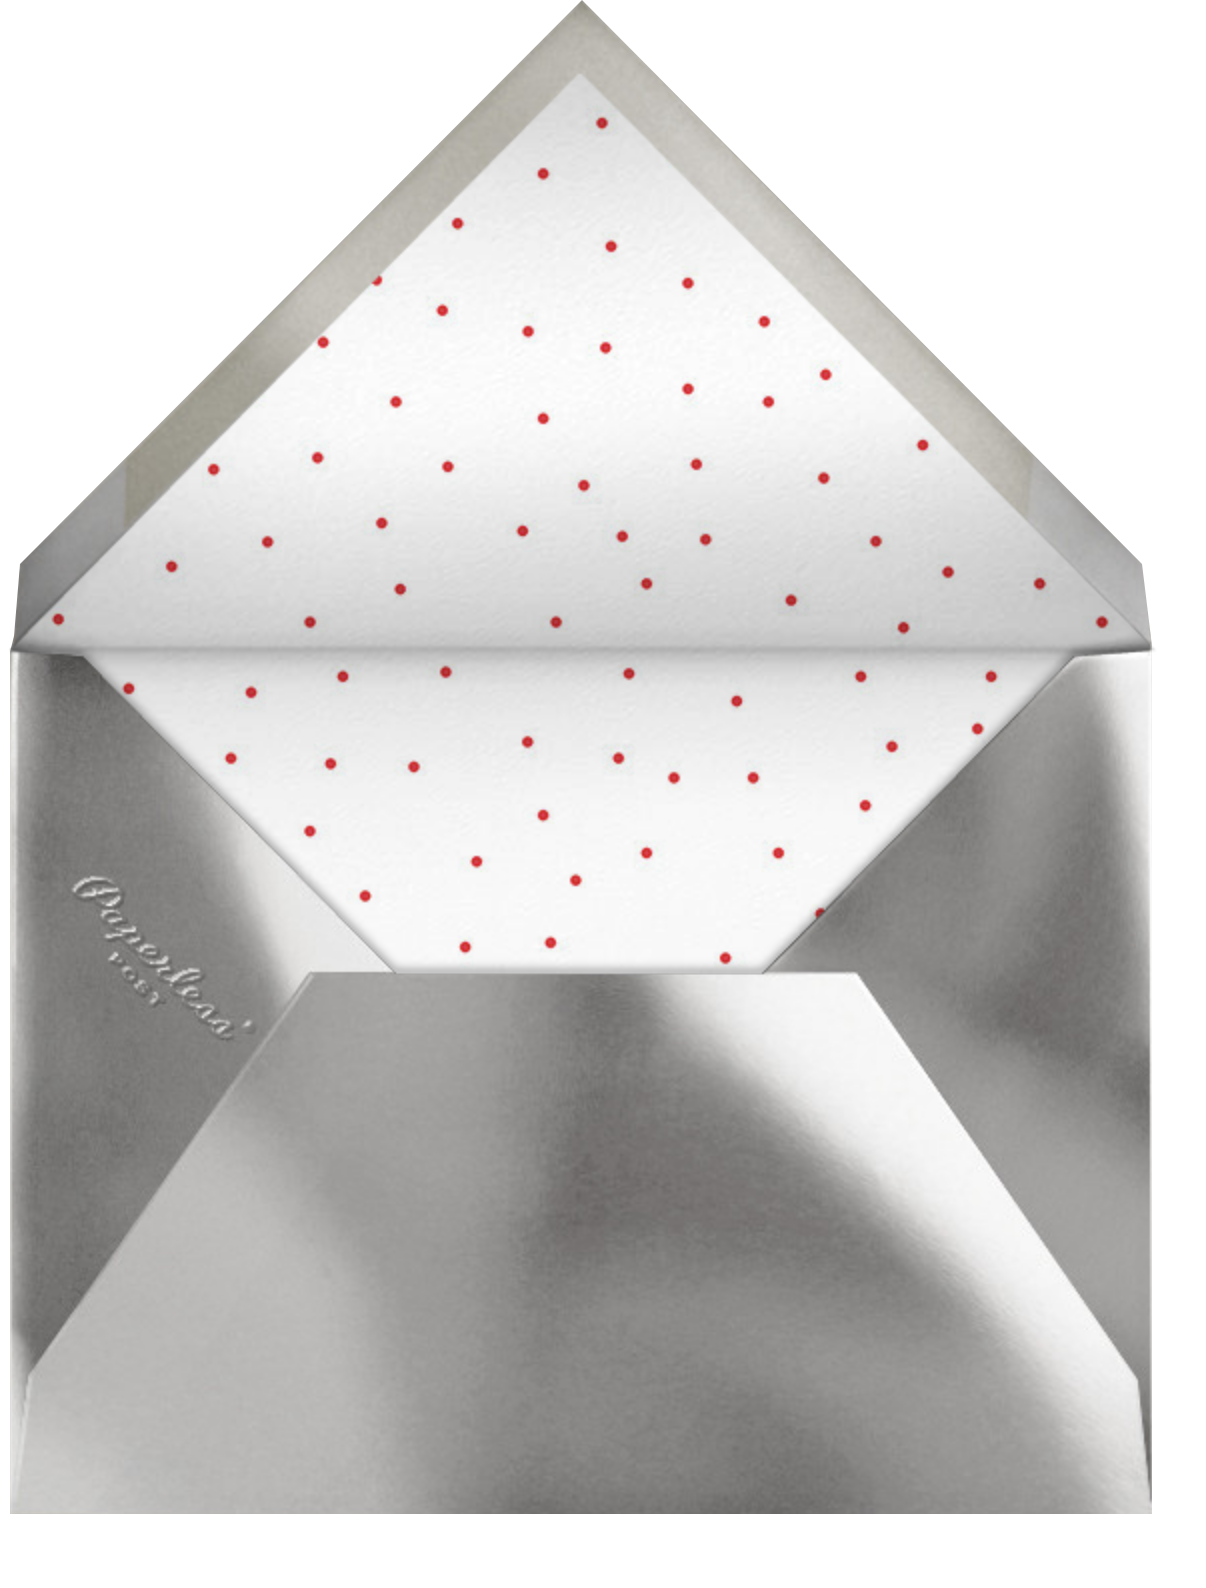 Rosina Photo - Red - Paperless Post - Designs we love - envelope back